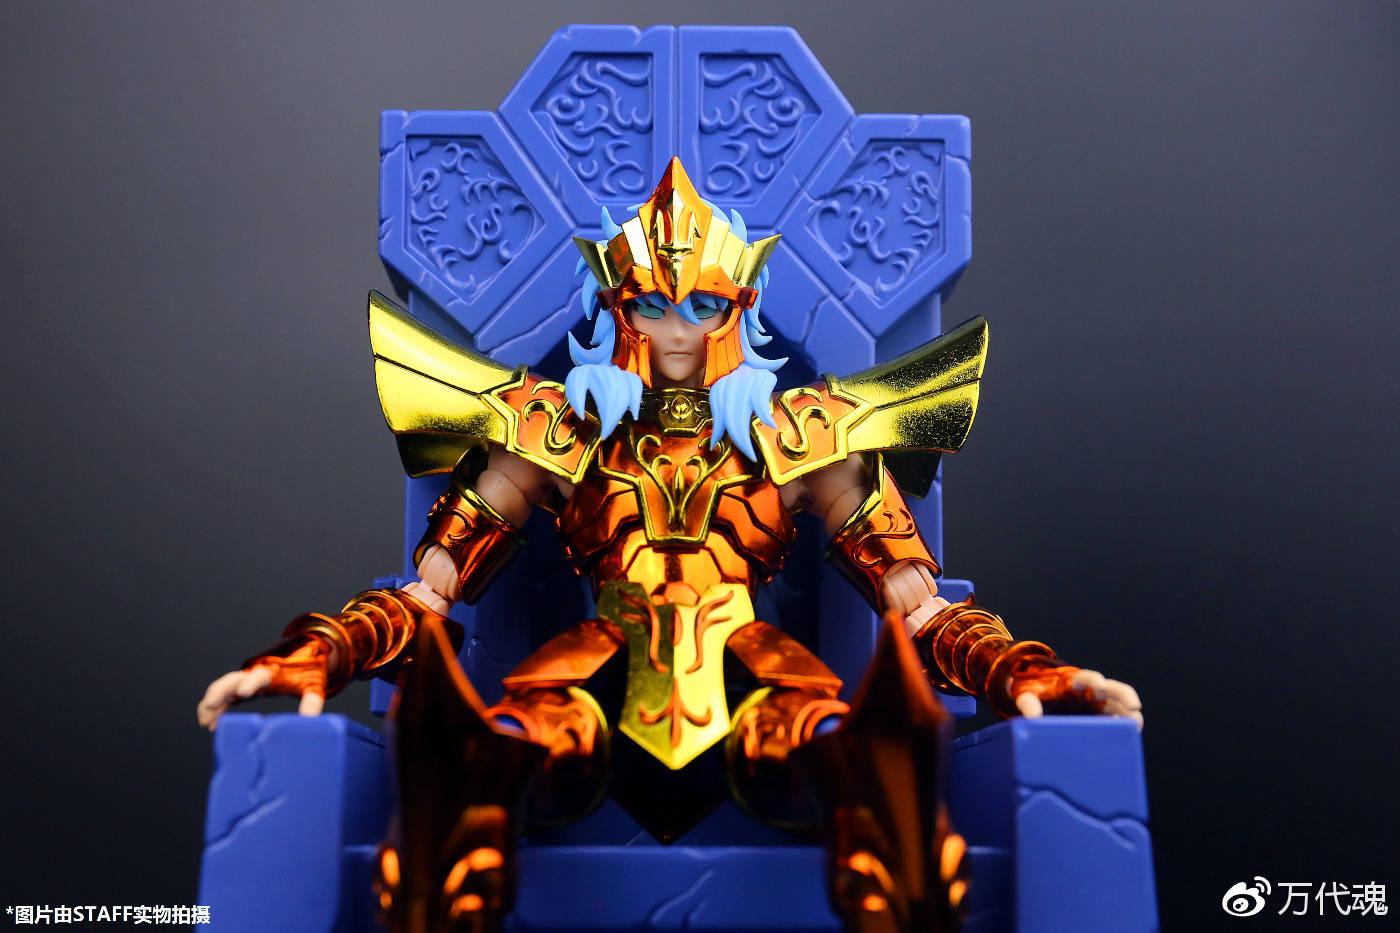 [Imagens] Poseidon EX & Poseidon EX Imperial Throne Set PjjMCrmK_o